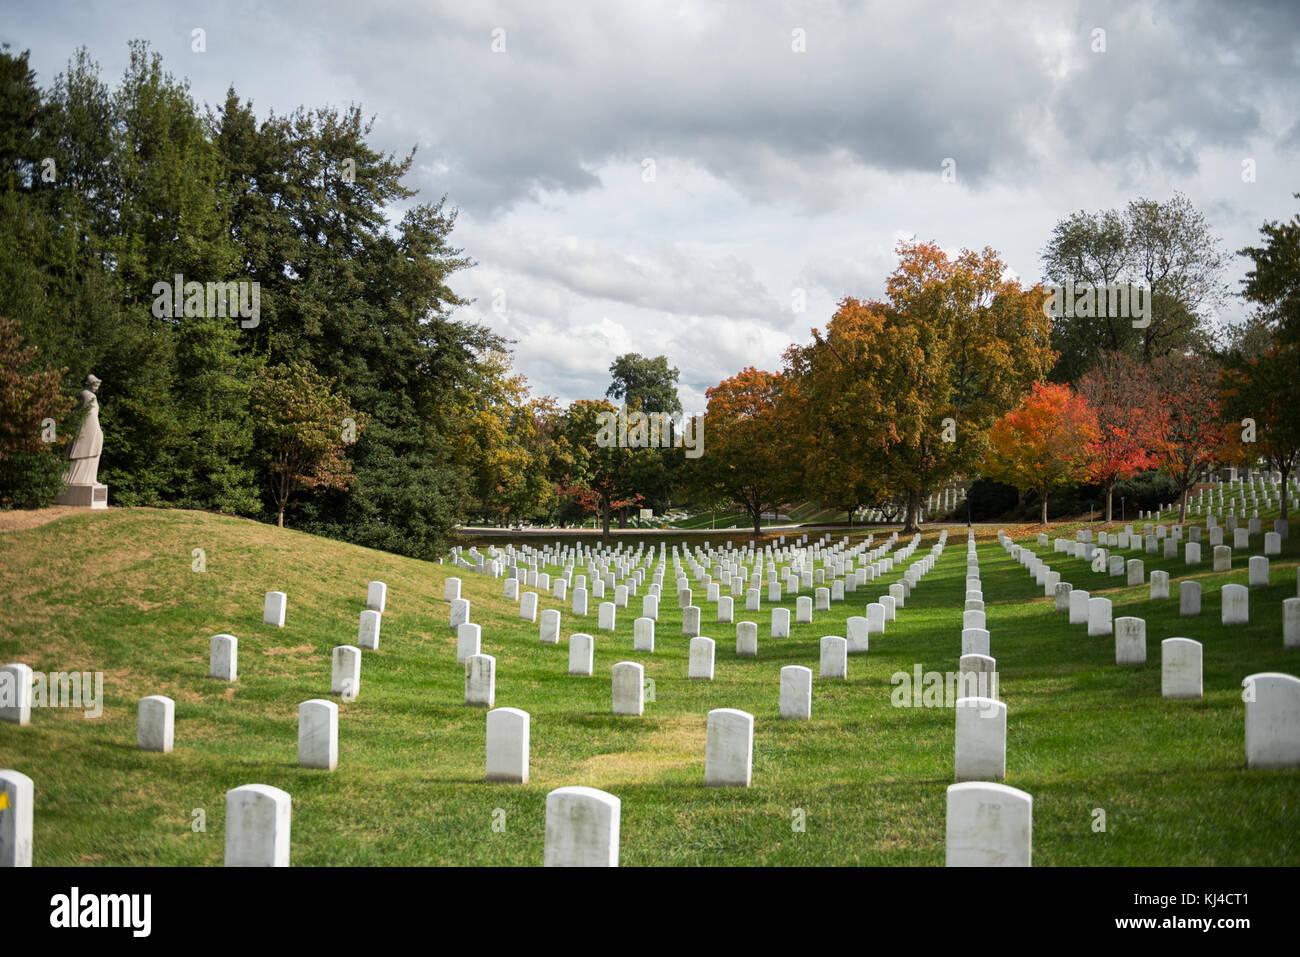 Fall Foliage at Arlington National Cemetery 2017 (37857522876) Stock Photo